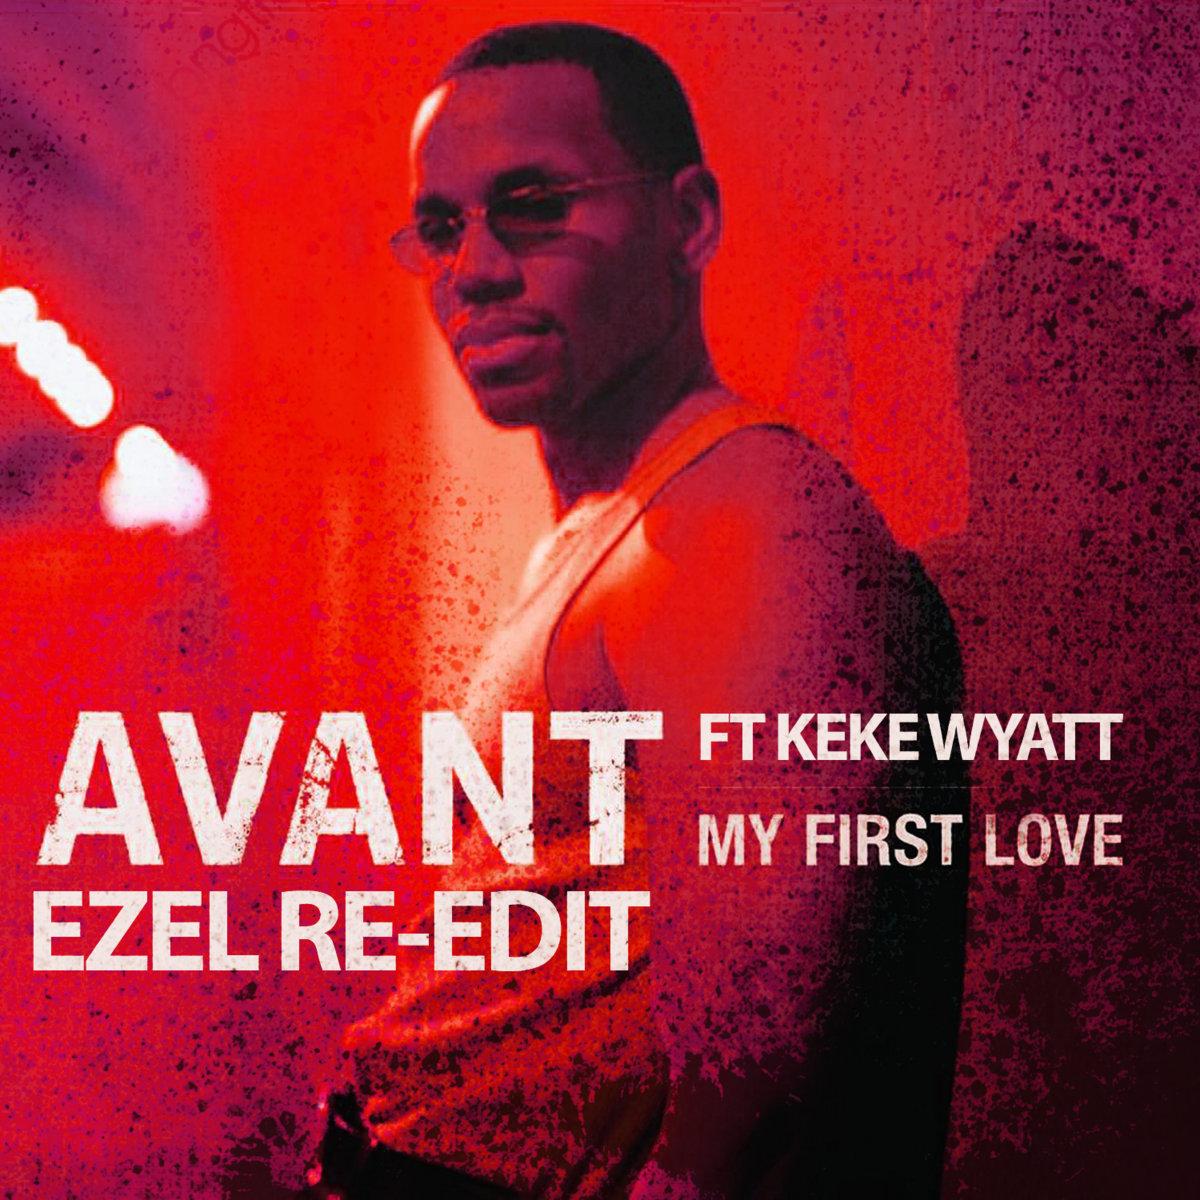 Avant feat. Keke Wyatt - My First Love (Ezel Re-Edit) [bandcamp]